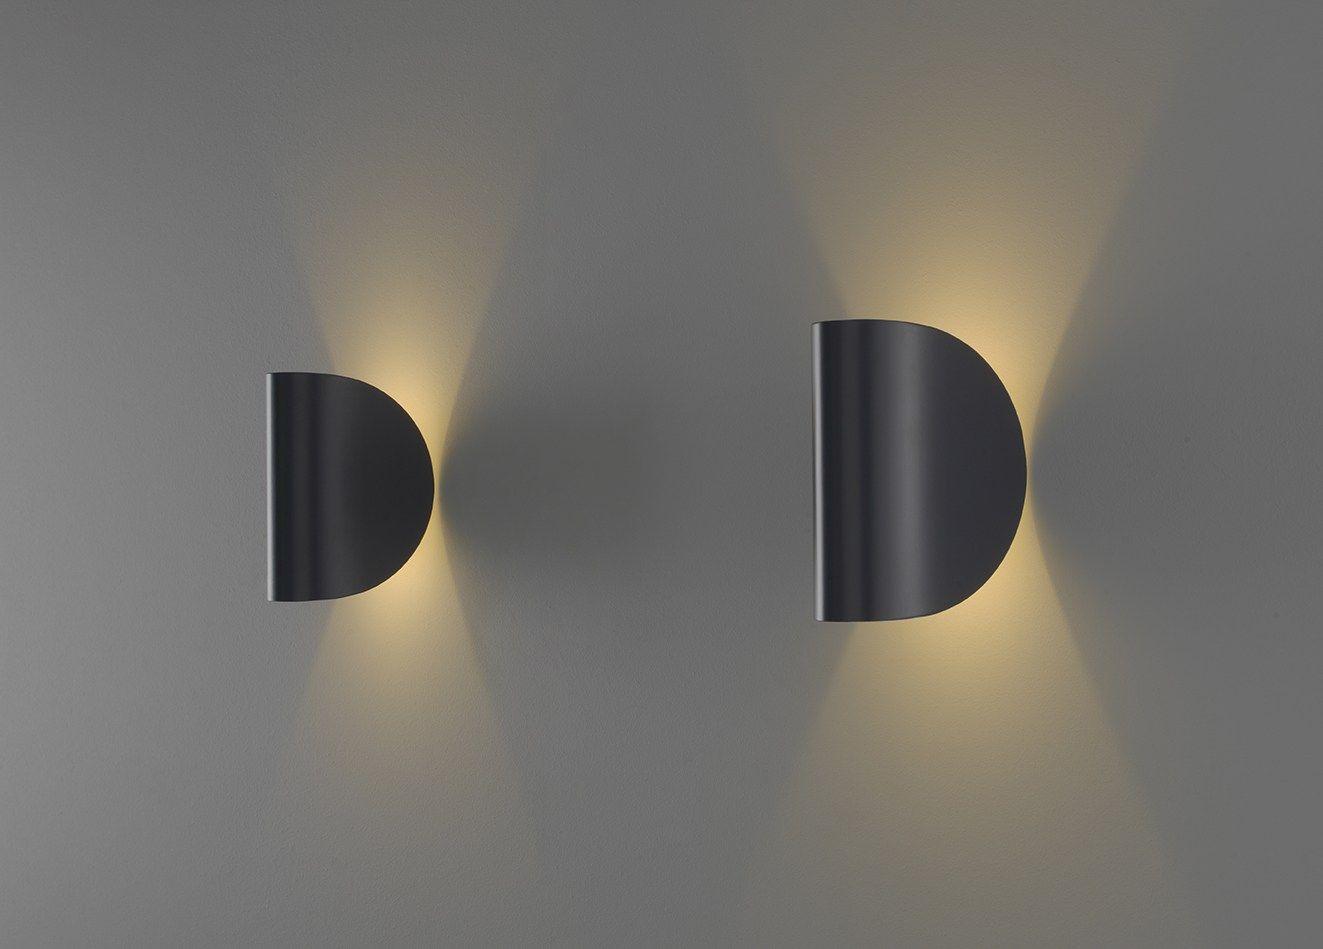 Applique murale à LED IO by FontanaArte design Claesson Koivisto Rune